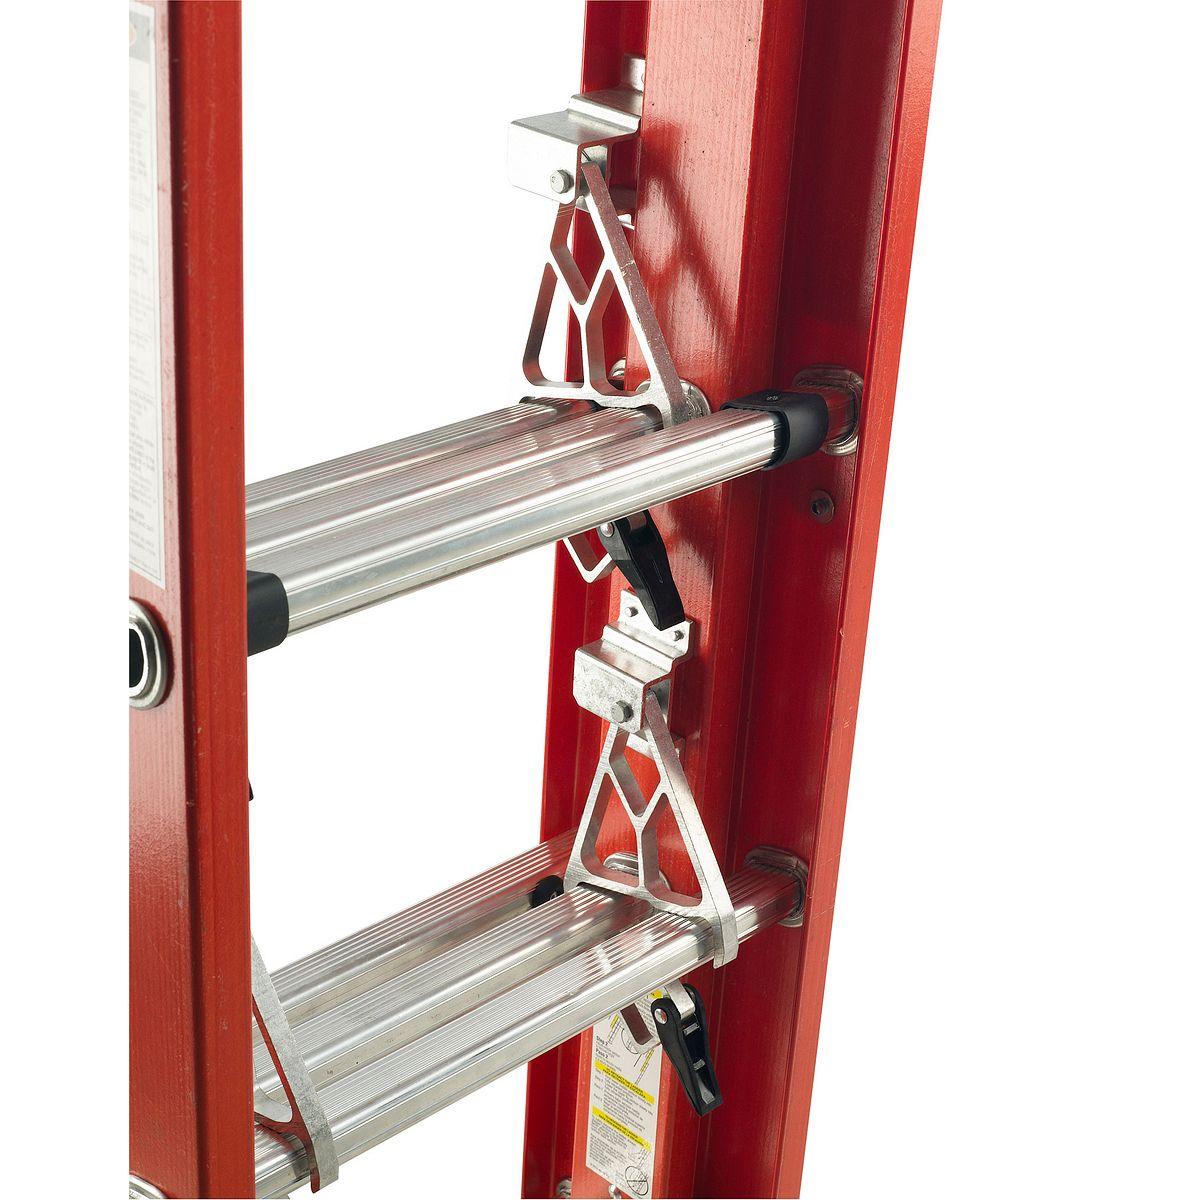 D6220 3 Extension Ladders Werner Us